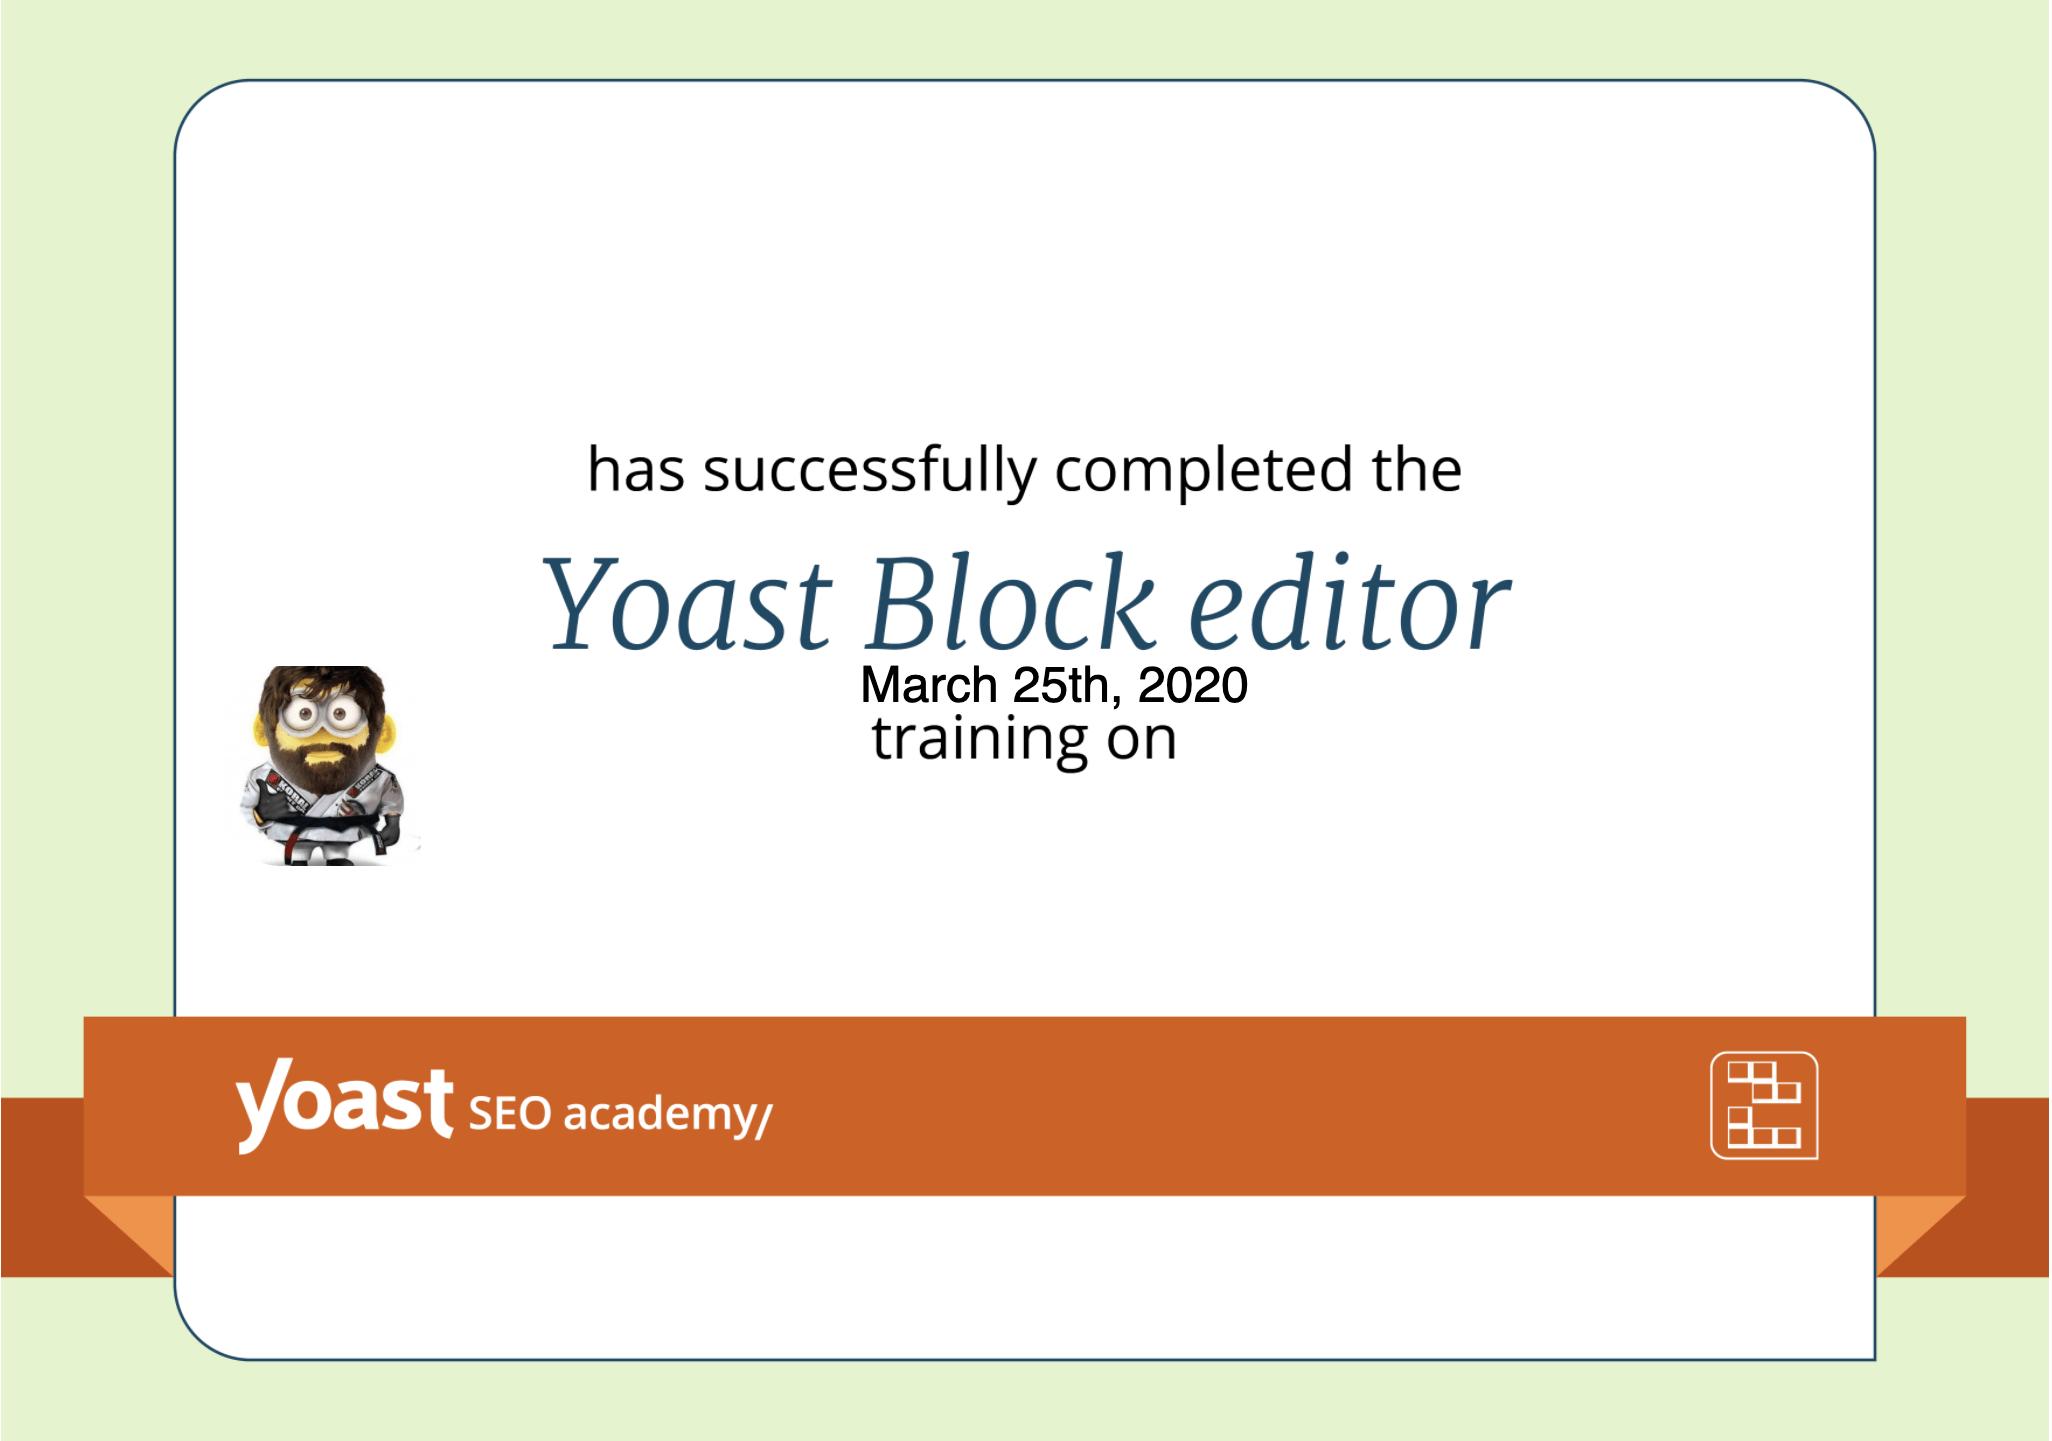 Yoast Block Editor